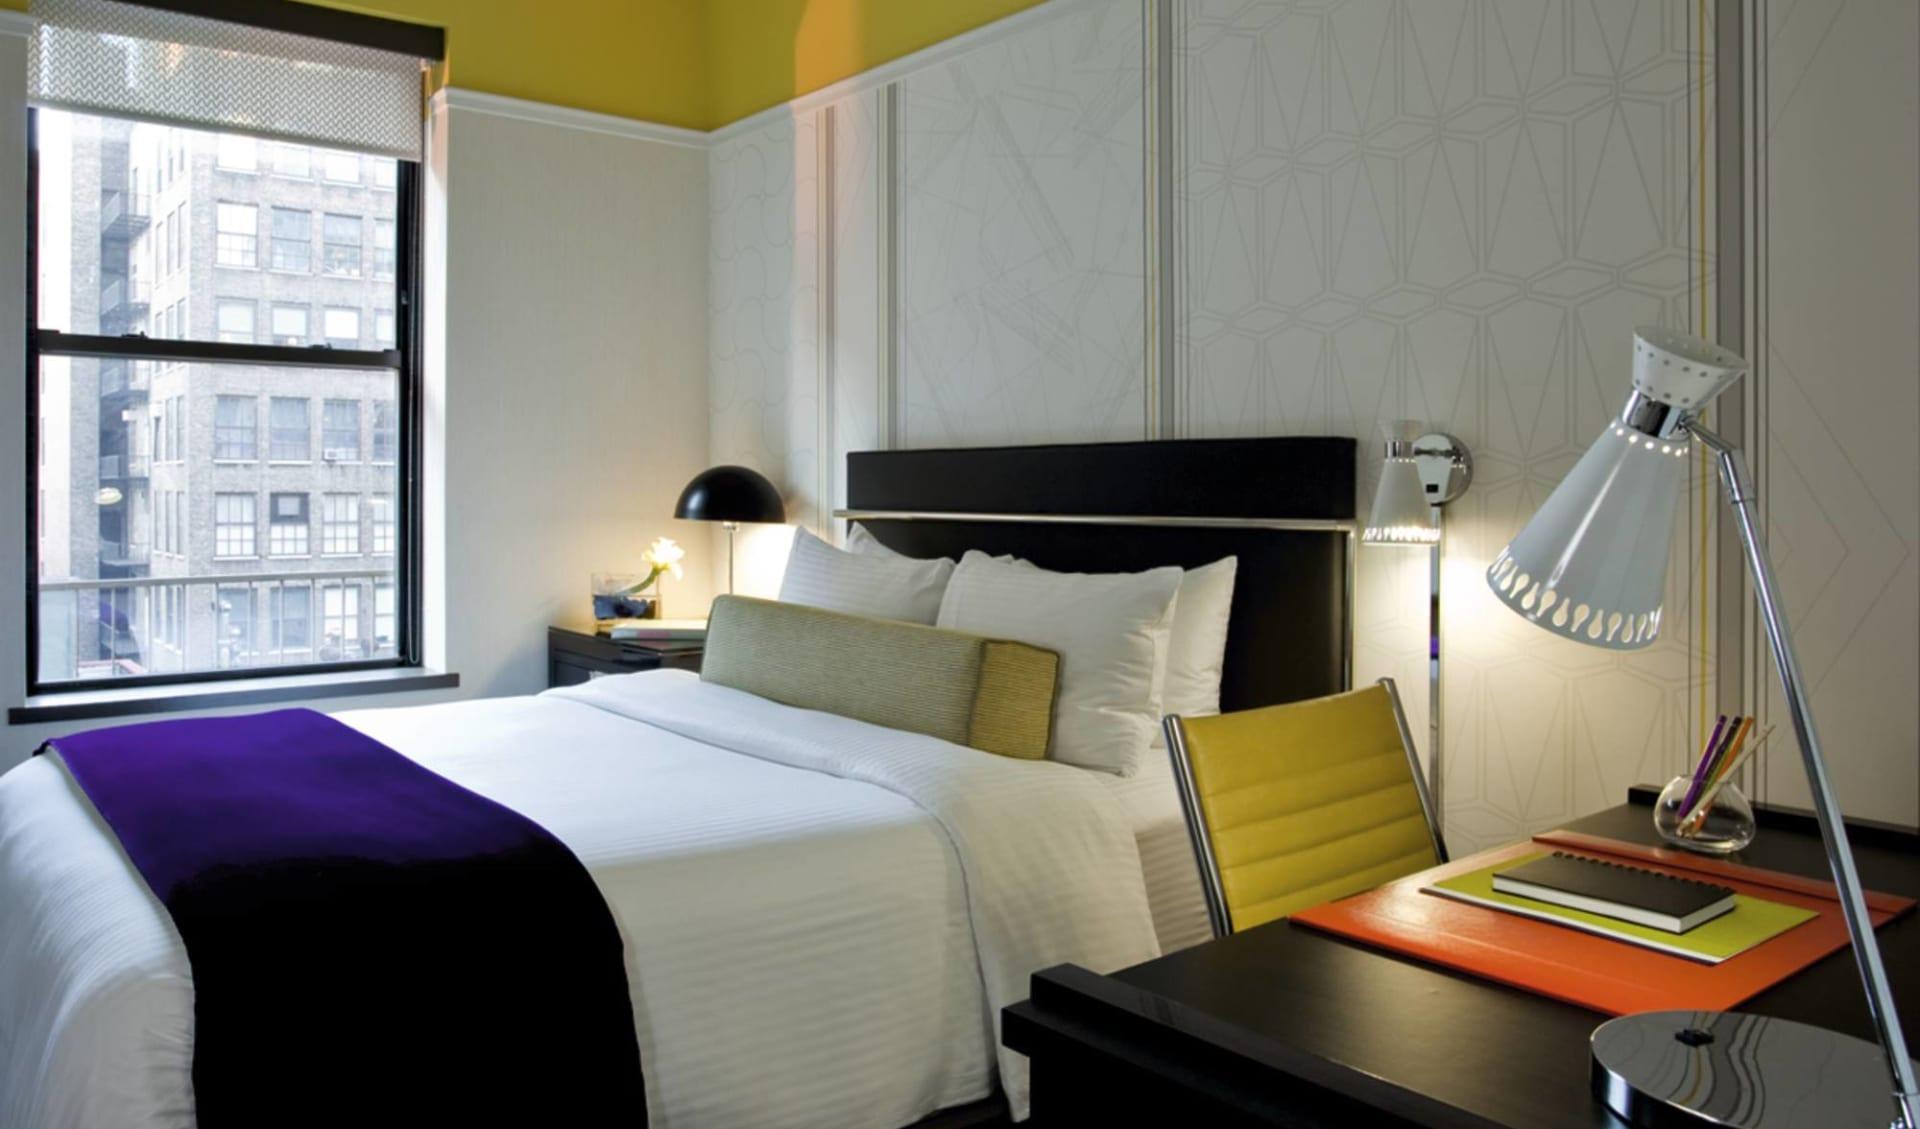 Martha Washington Hotel in New York - Manhattan:  Martha Washington - Doppelzimmer